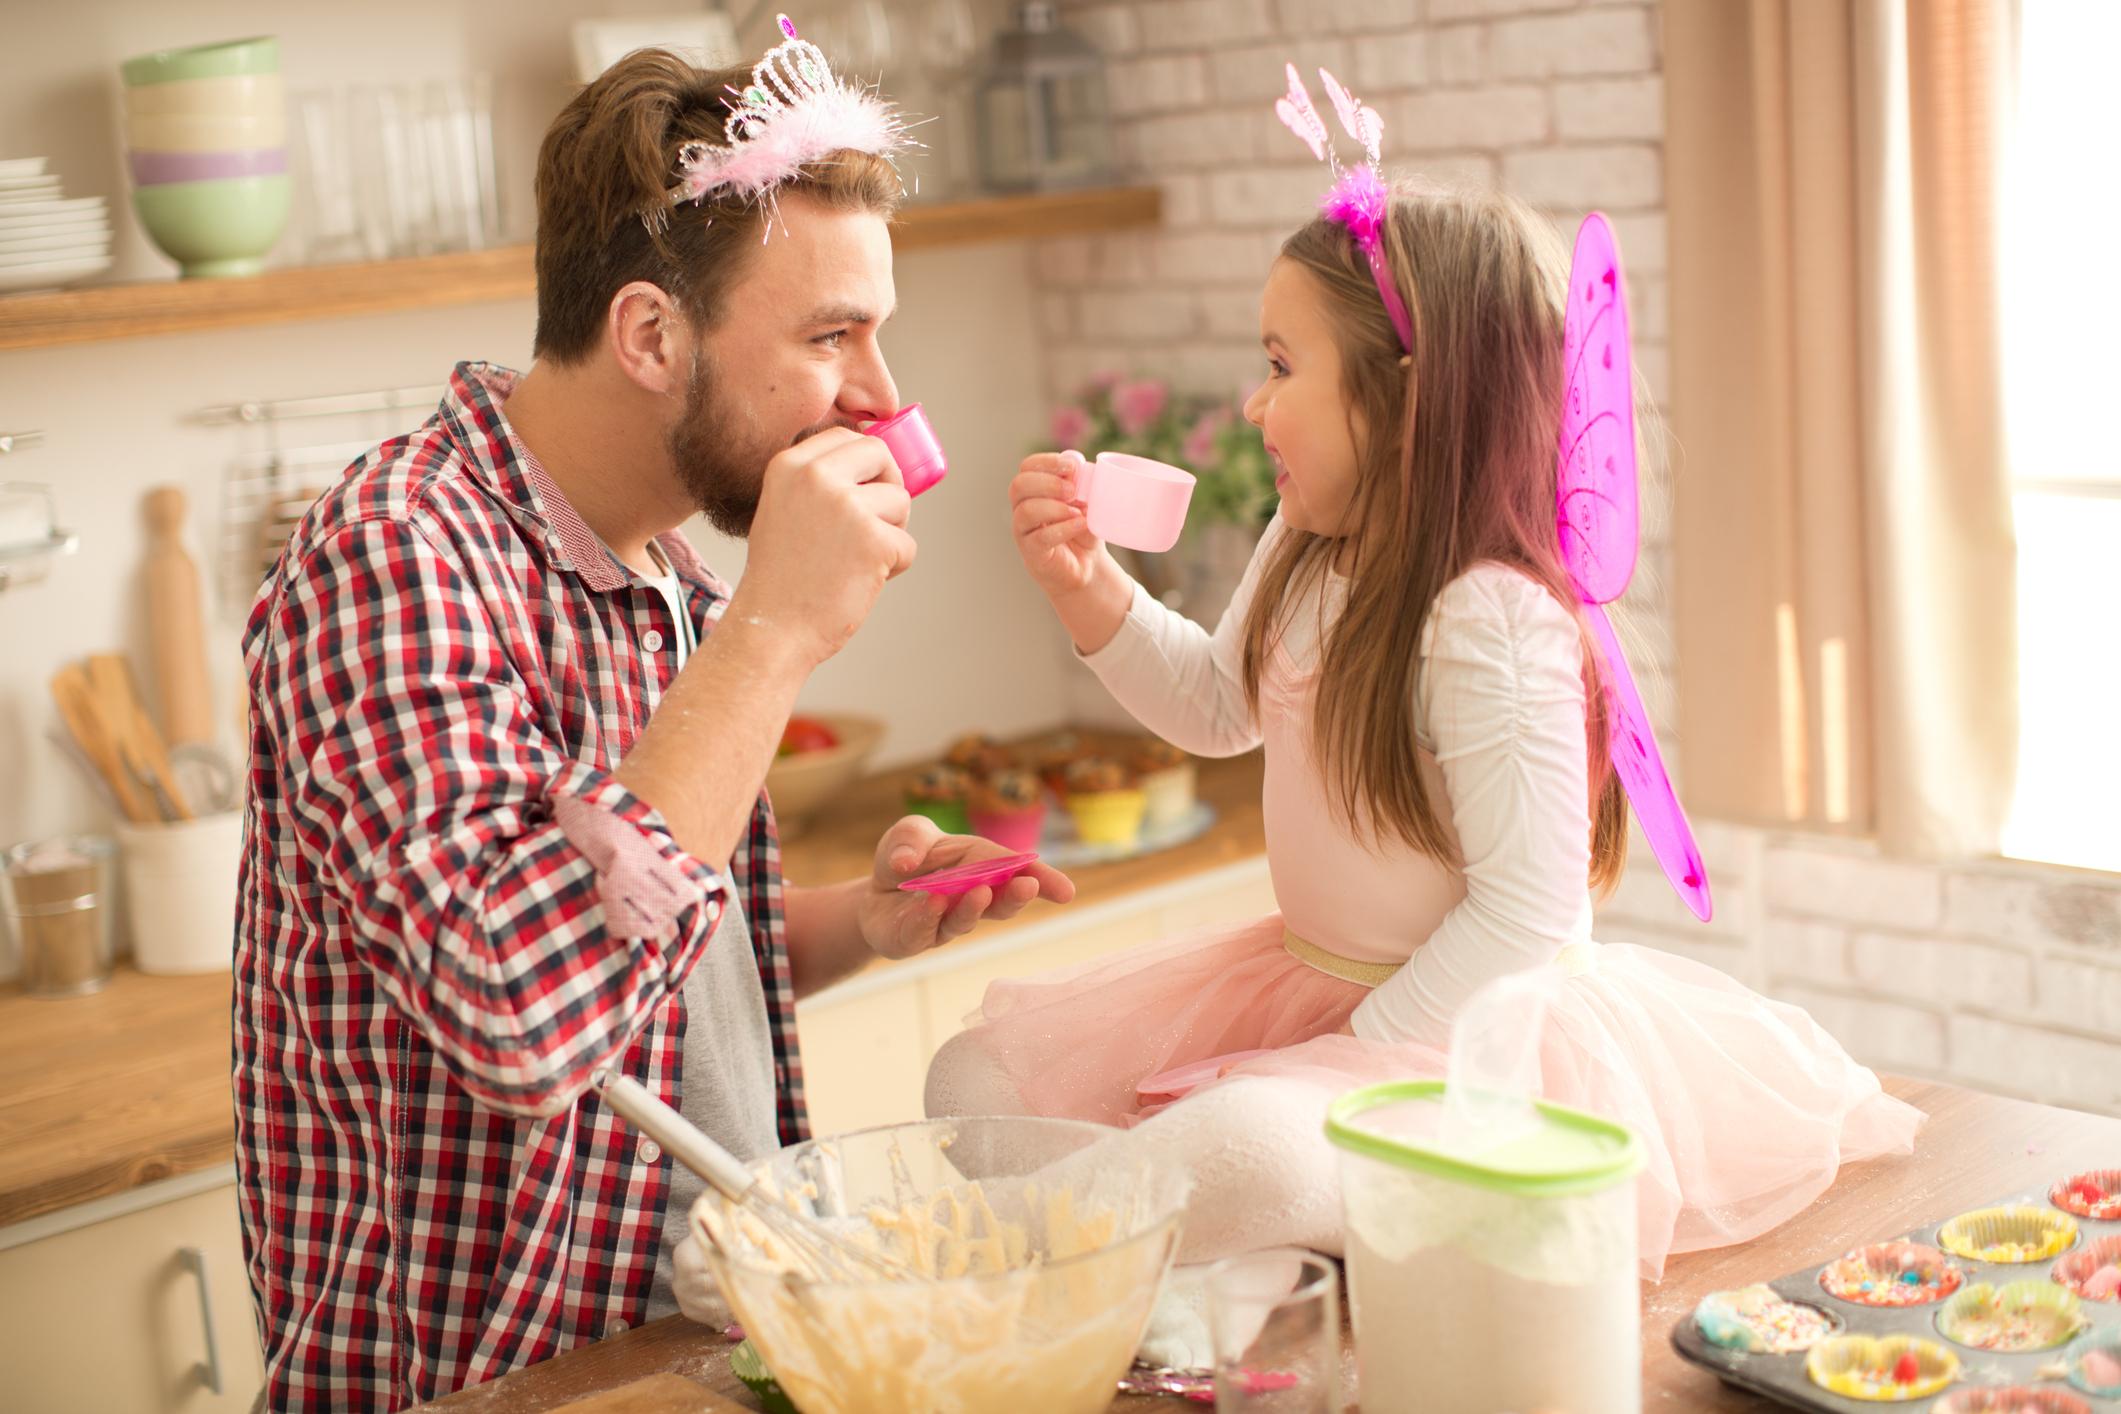 Картинки для дочери и мужа такой